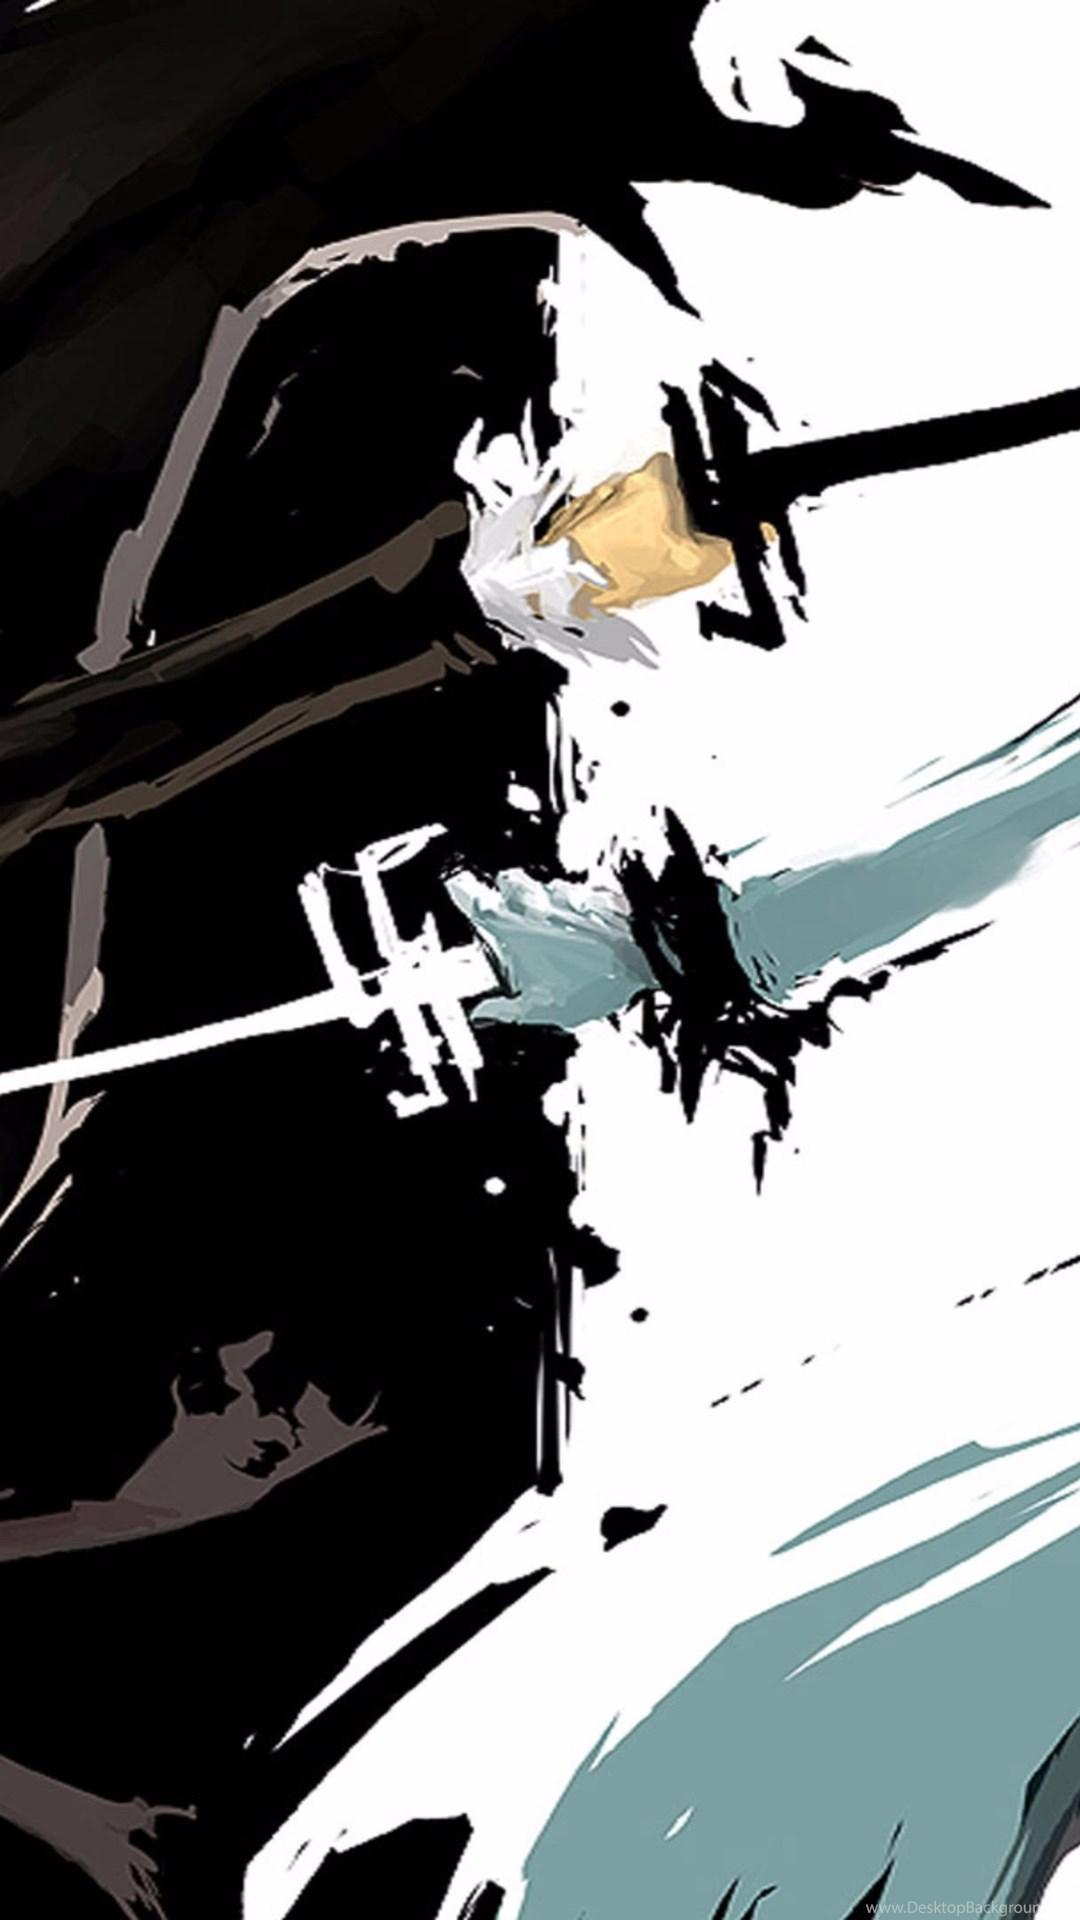 21 4k Anime Wallpaper Android   Sachi Wallpaper 1080x1920